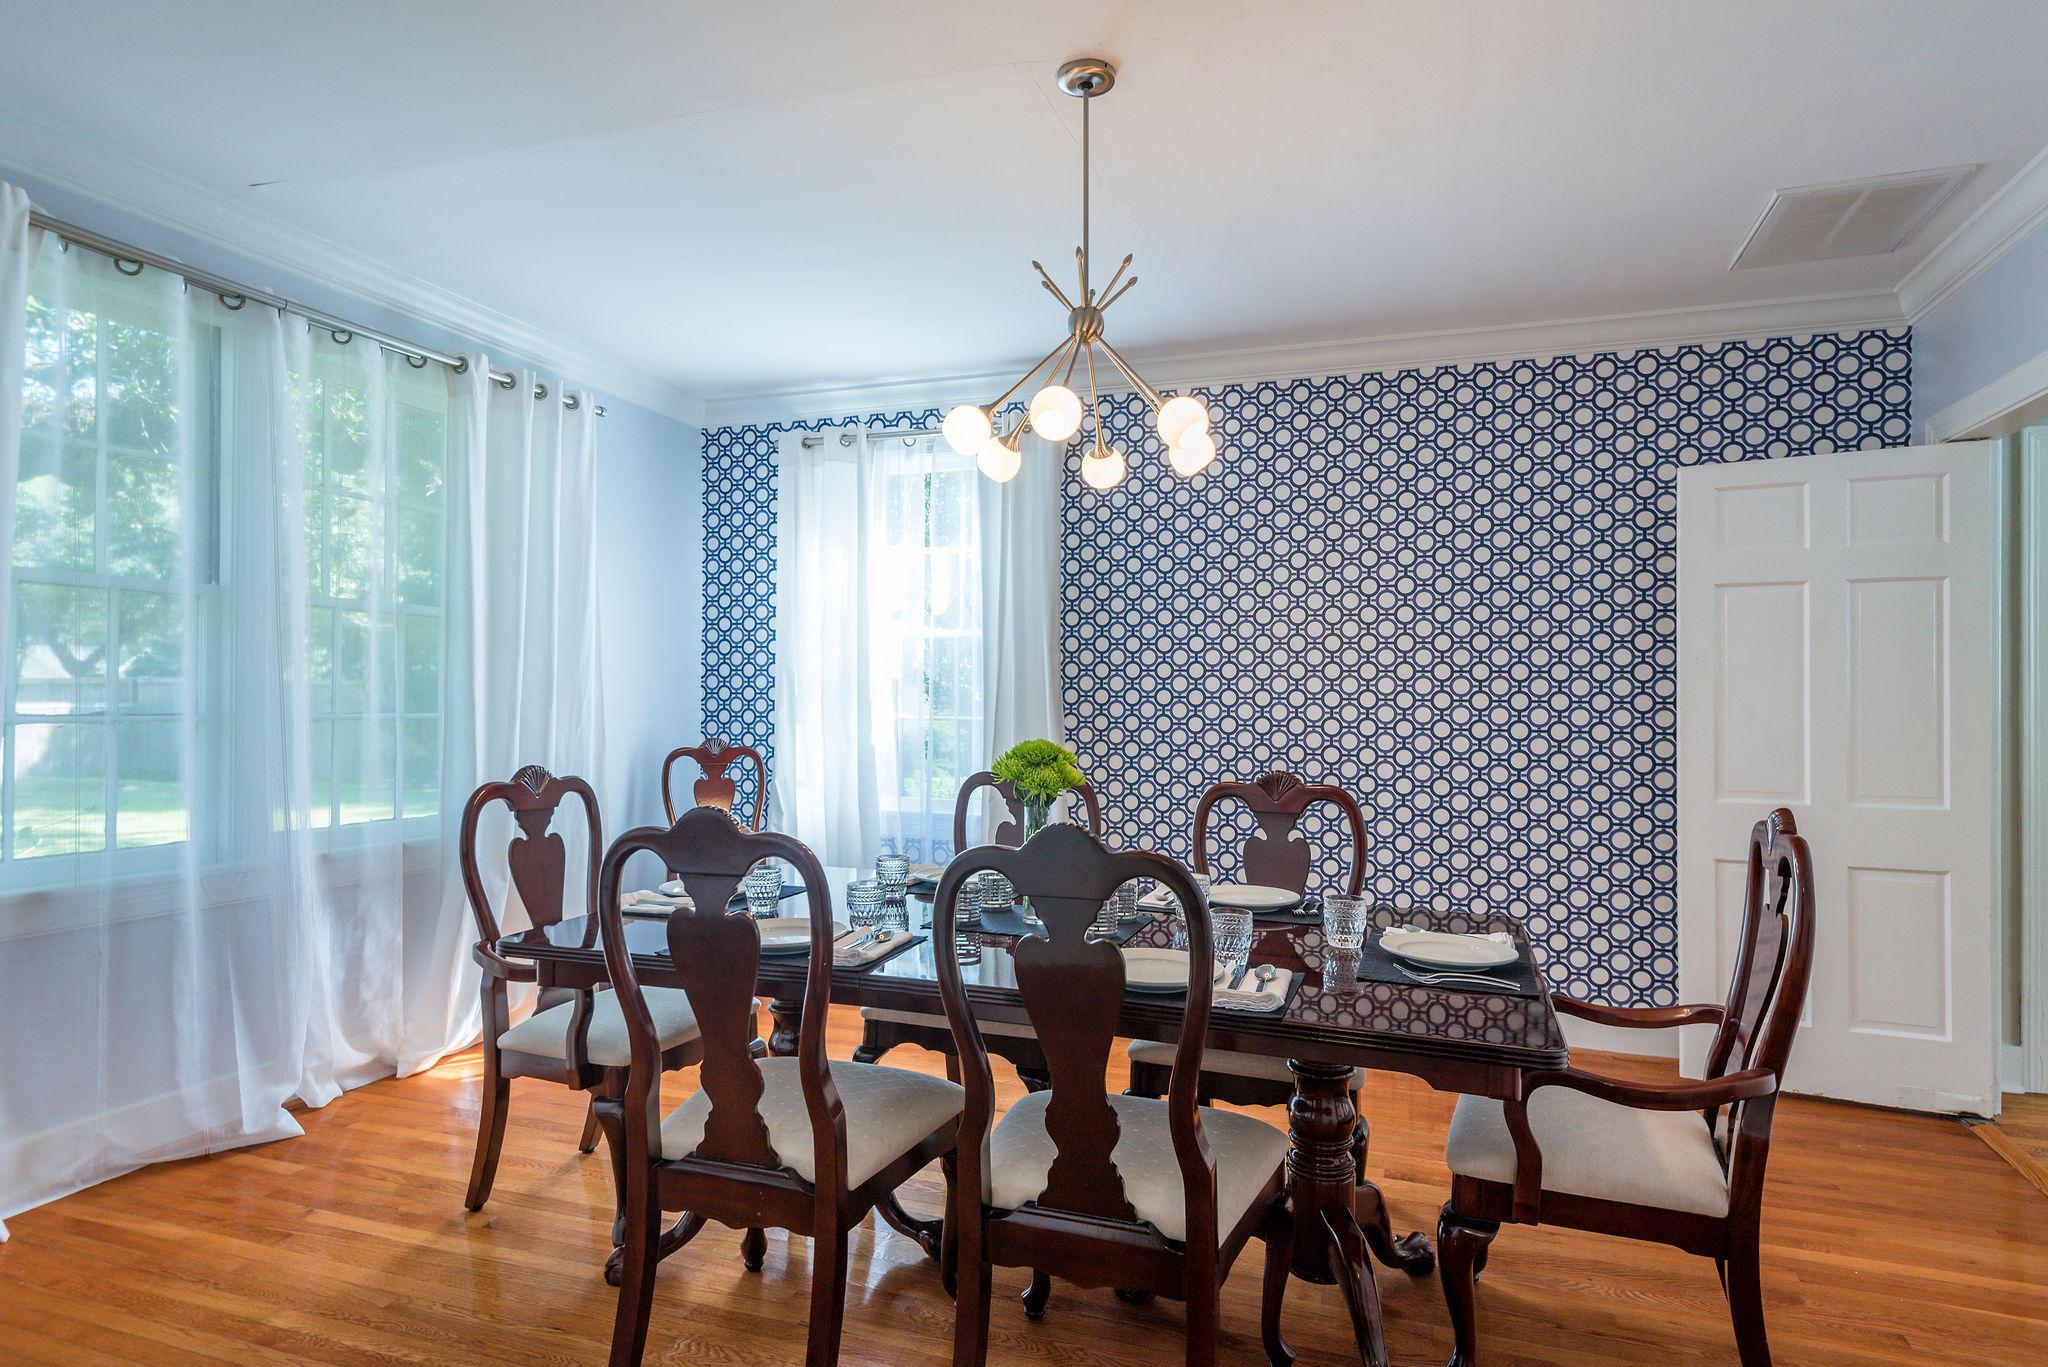 Sylvan Shores Homes For Sale - 450 Polony, Charleston, SC - 0